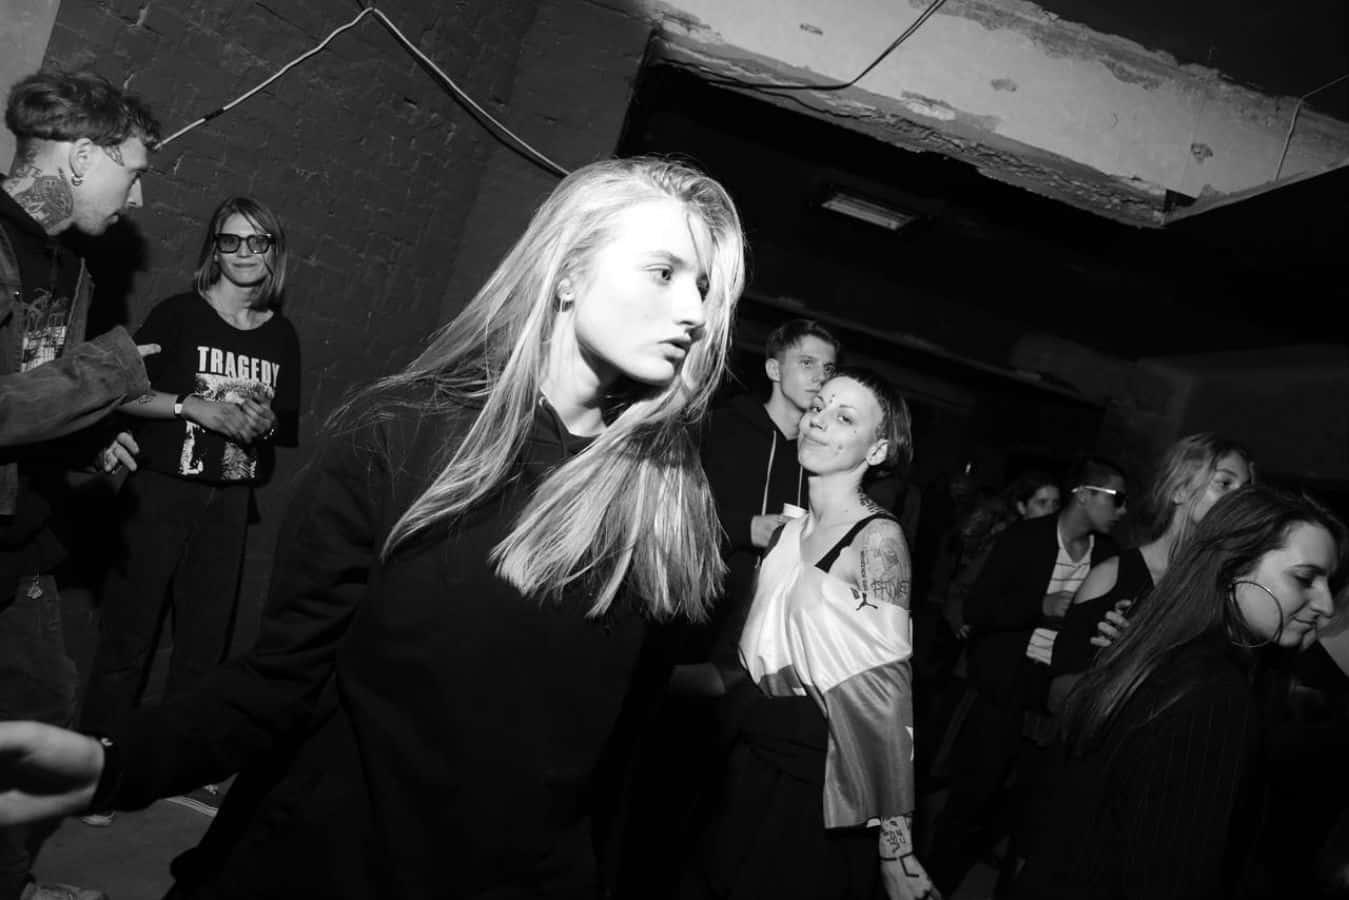 Jugendhub Sonya Stepanova Black and White